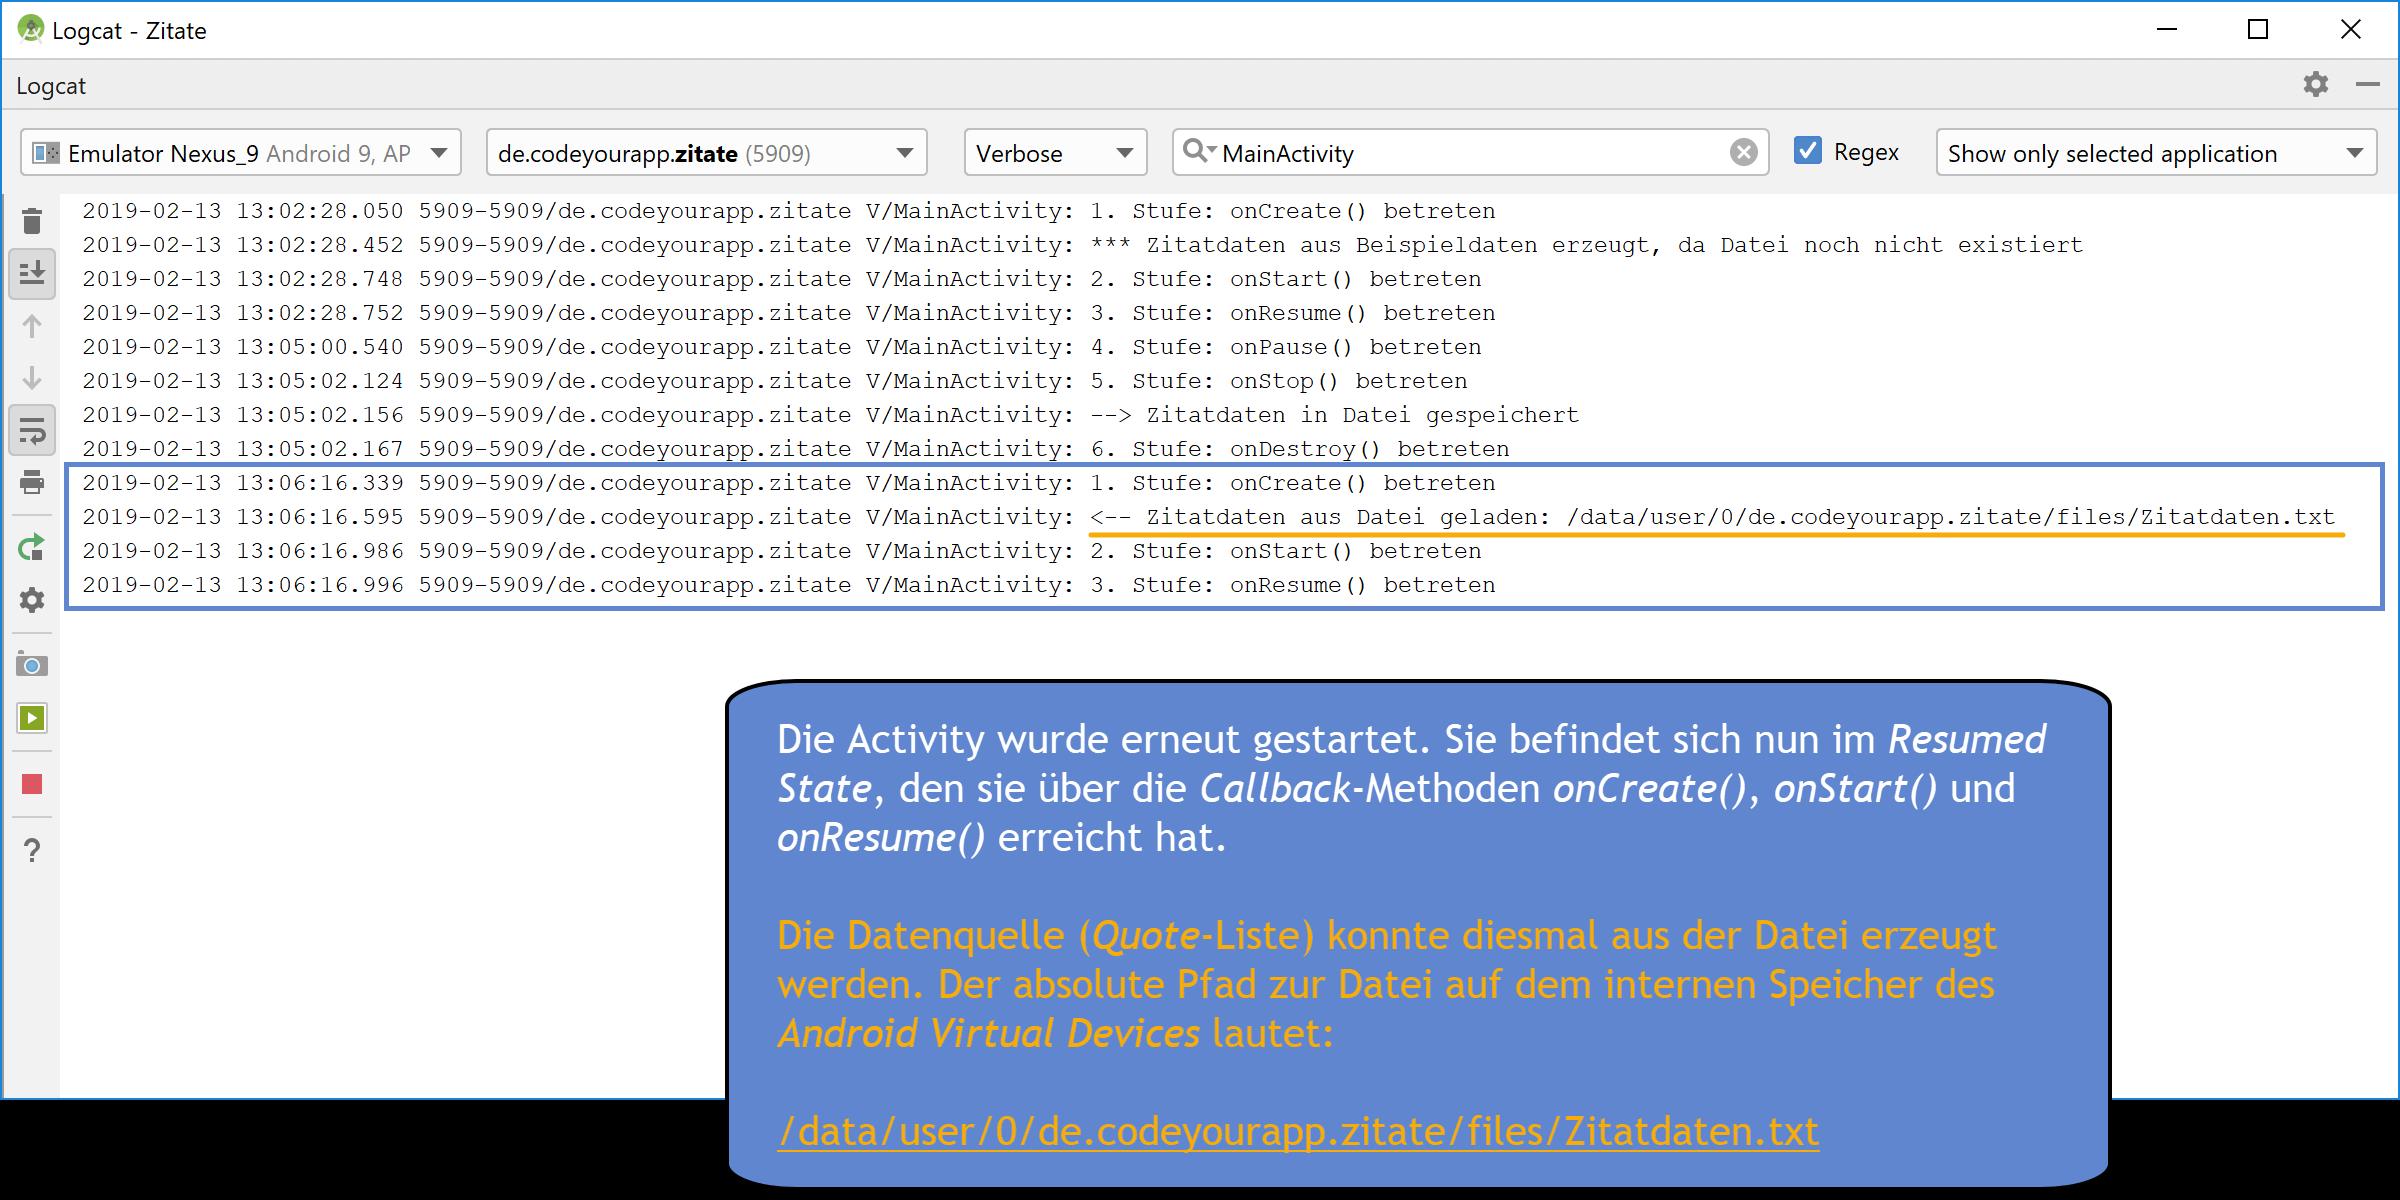 log_save_restore_file_3aa